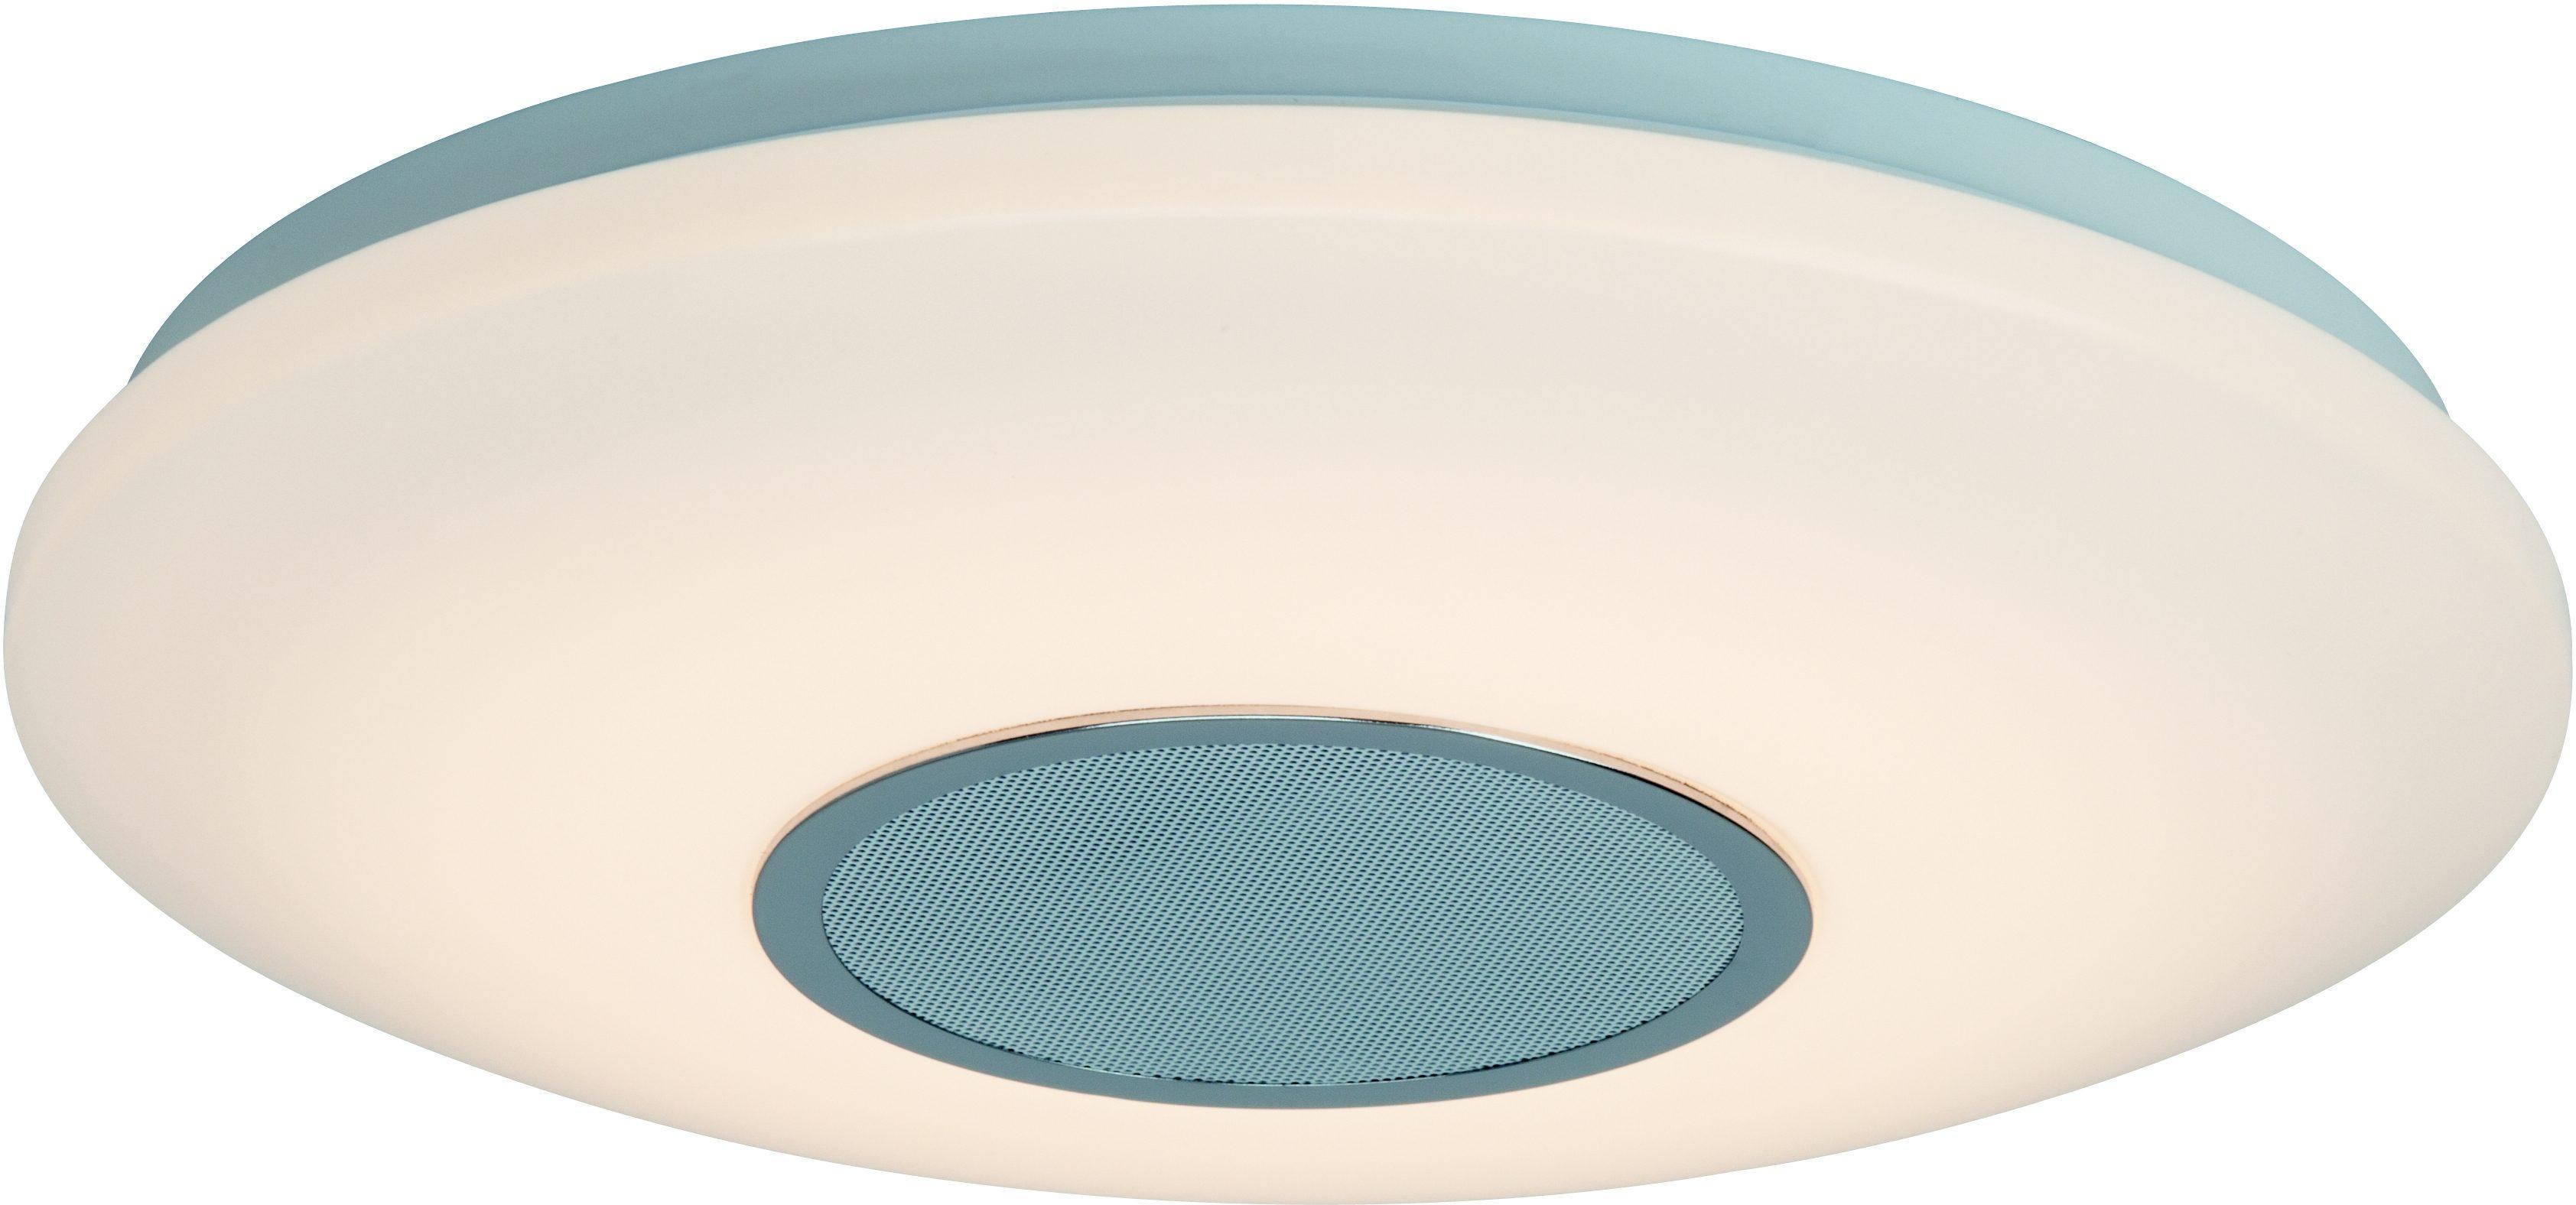 AEG LED Deckenleuchte, 1flg., »Bailando«